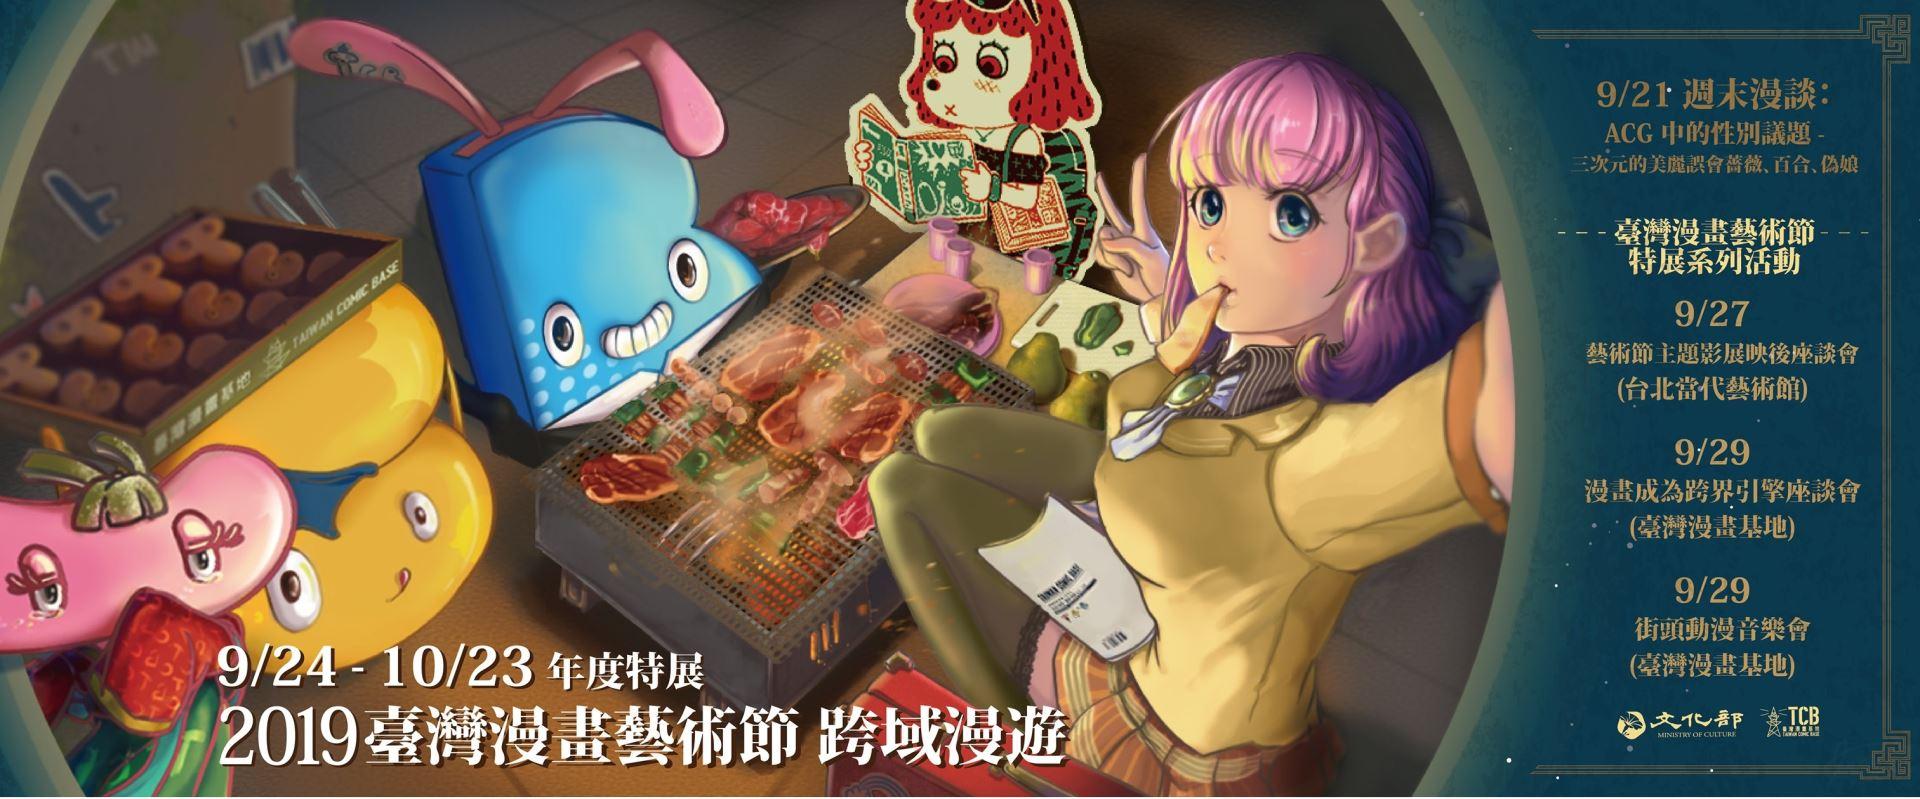 2019 Taiwan Comic Art Festival[另開新視窗]